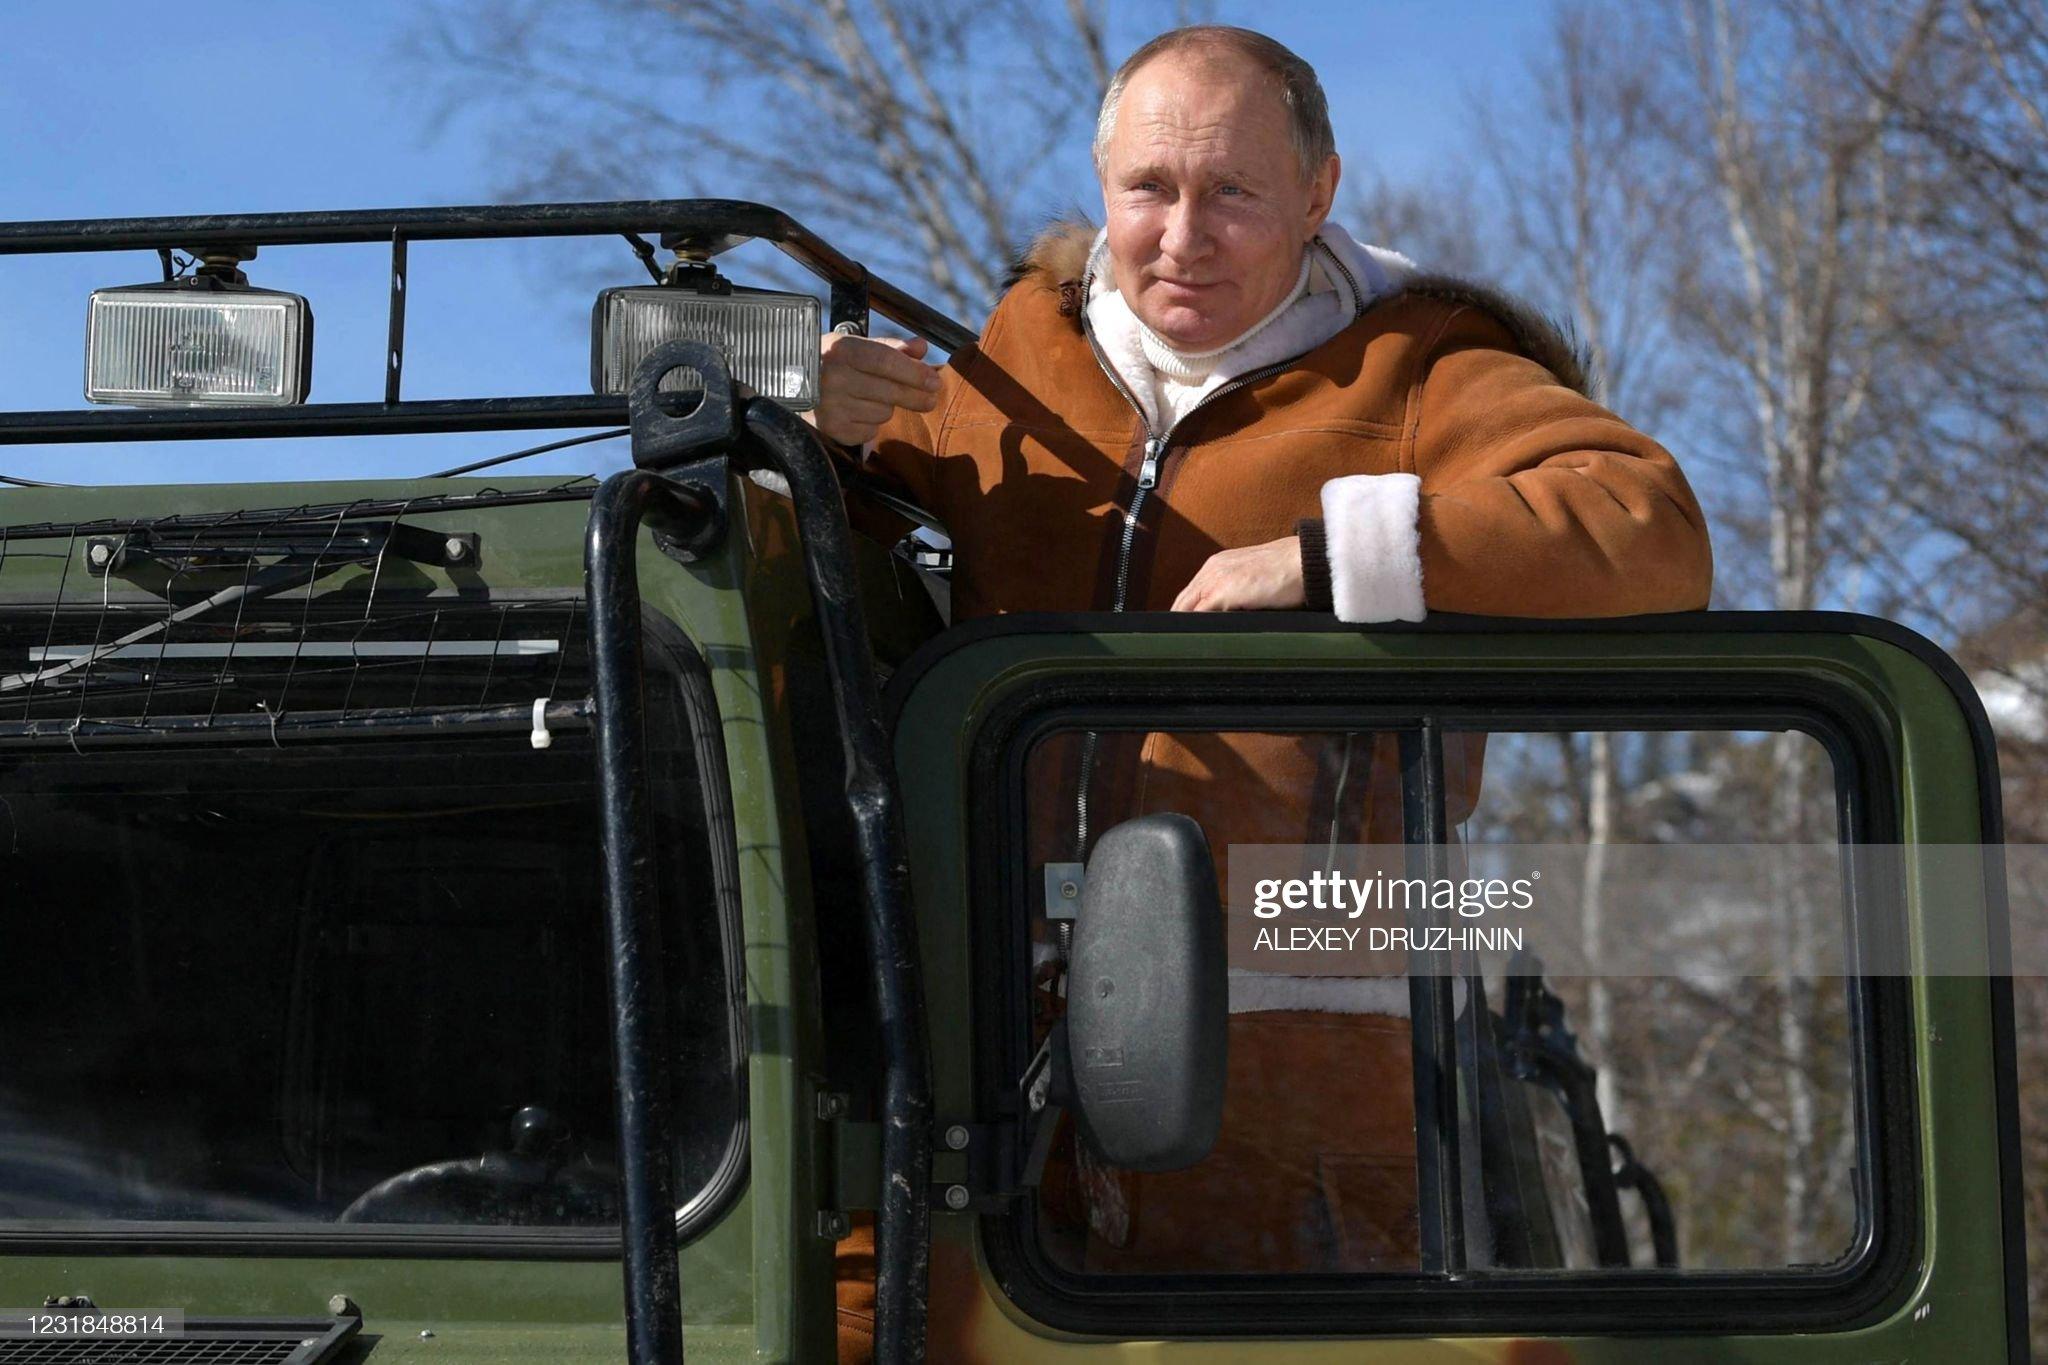 RUSSIA-POLITICS-ARMY : News Photo